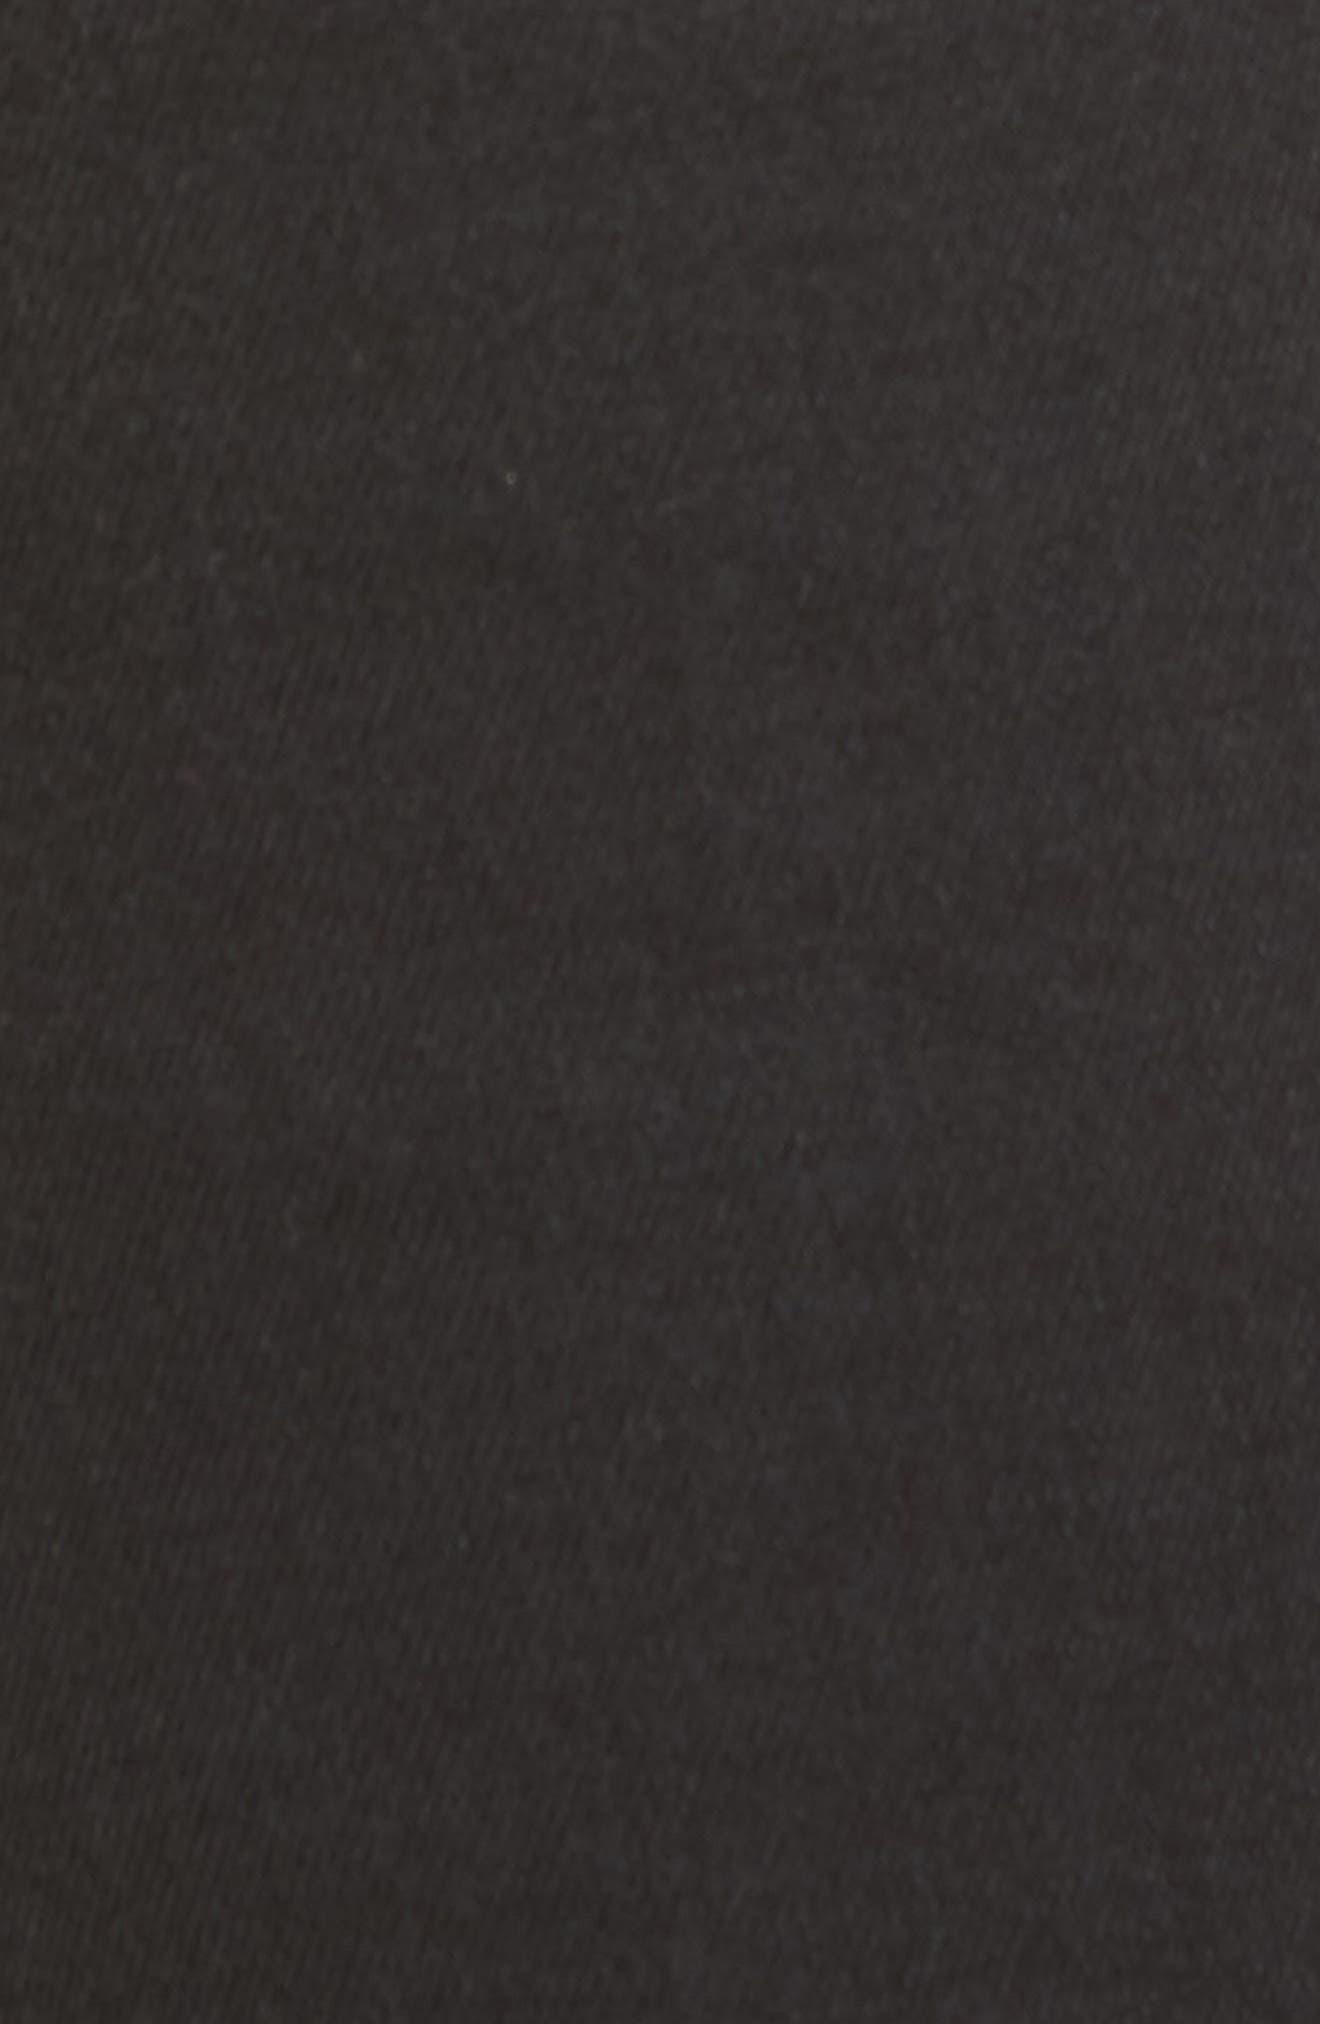 Donna Skinny Jeans,                             Alternate thumbnail 5, color,                             018